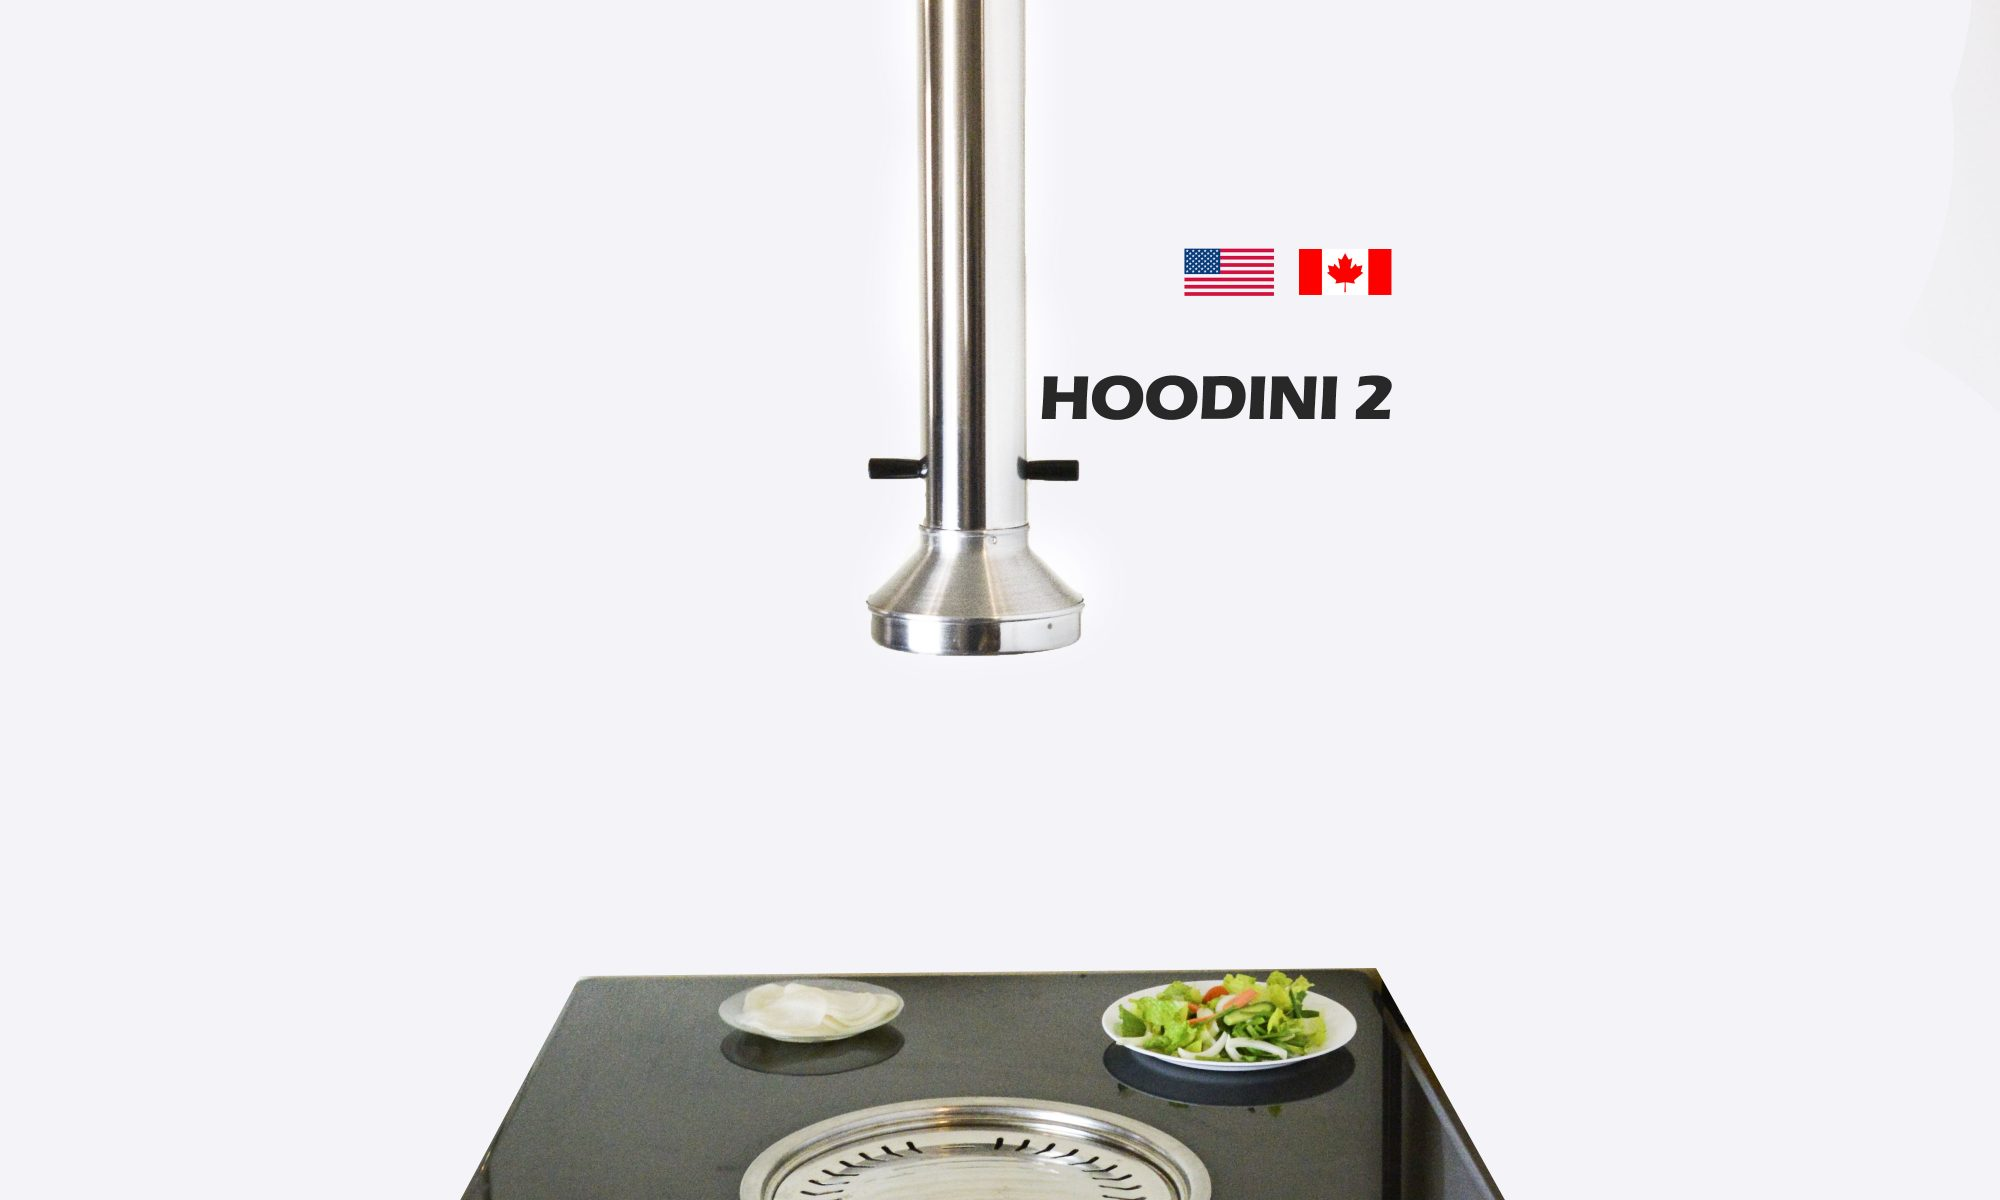 Hoodini 2